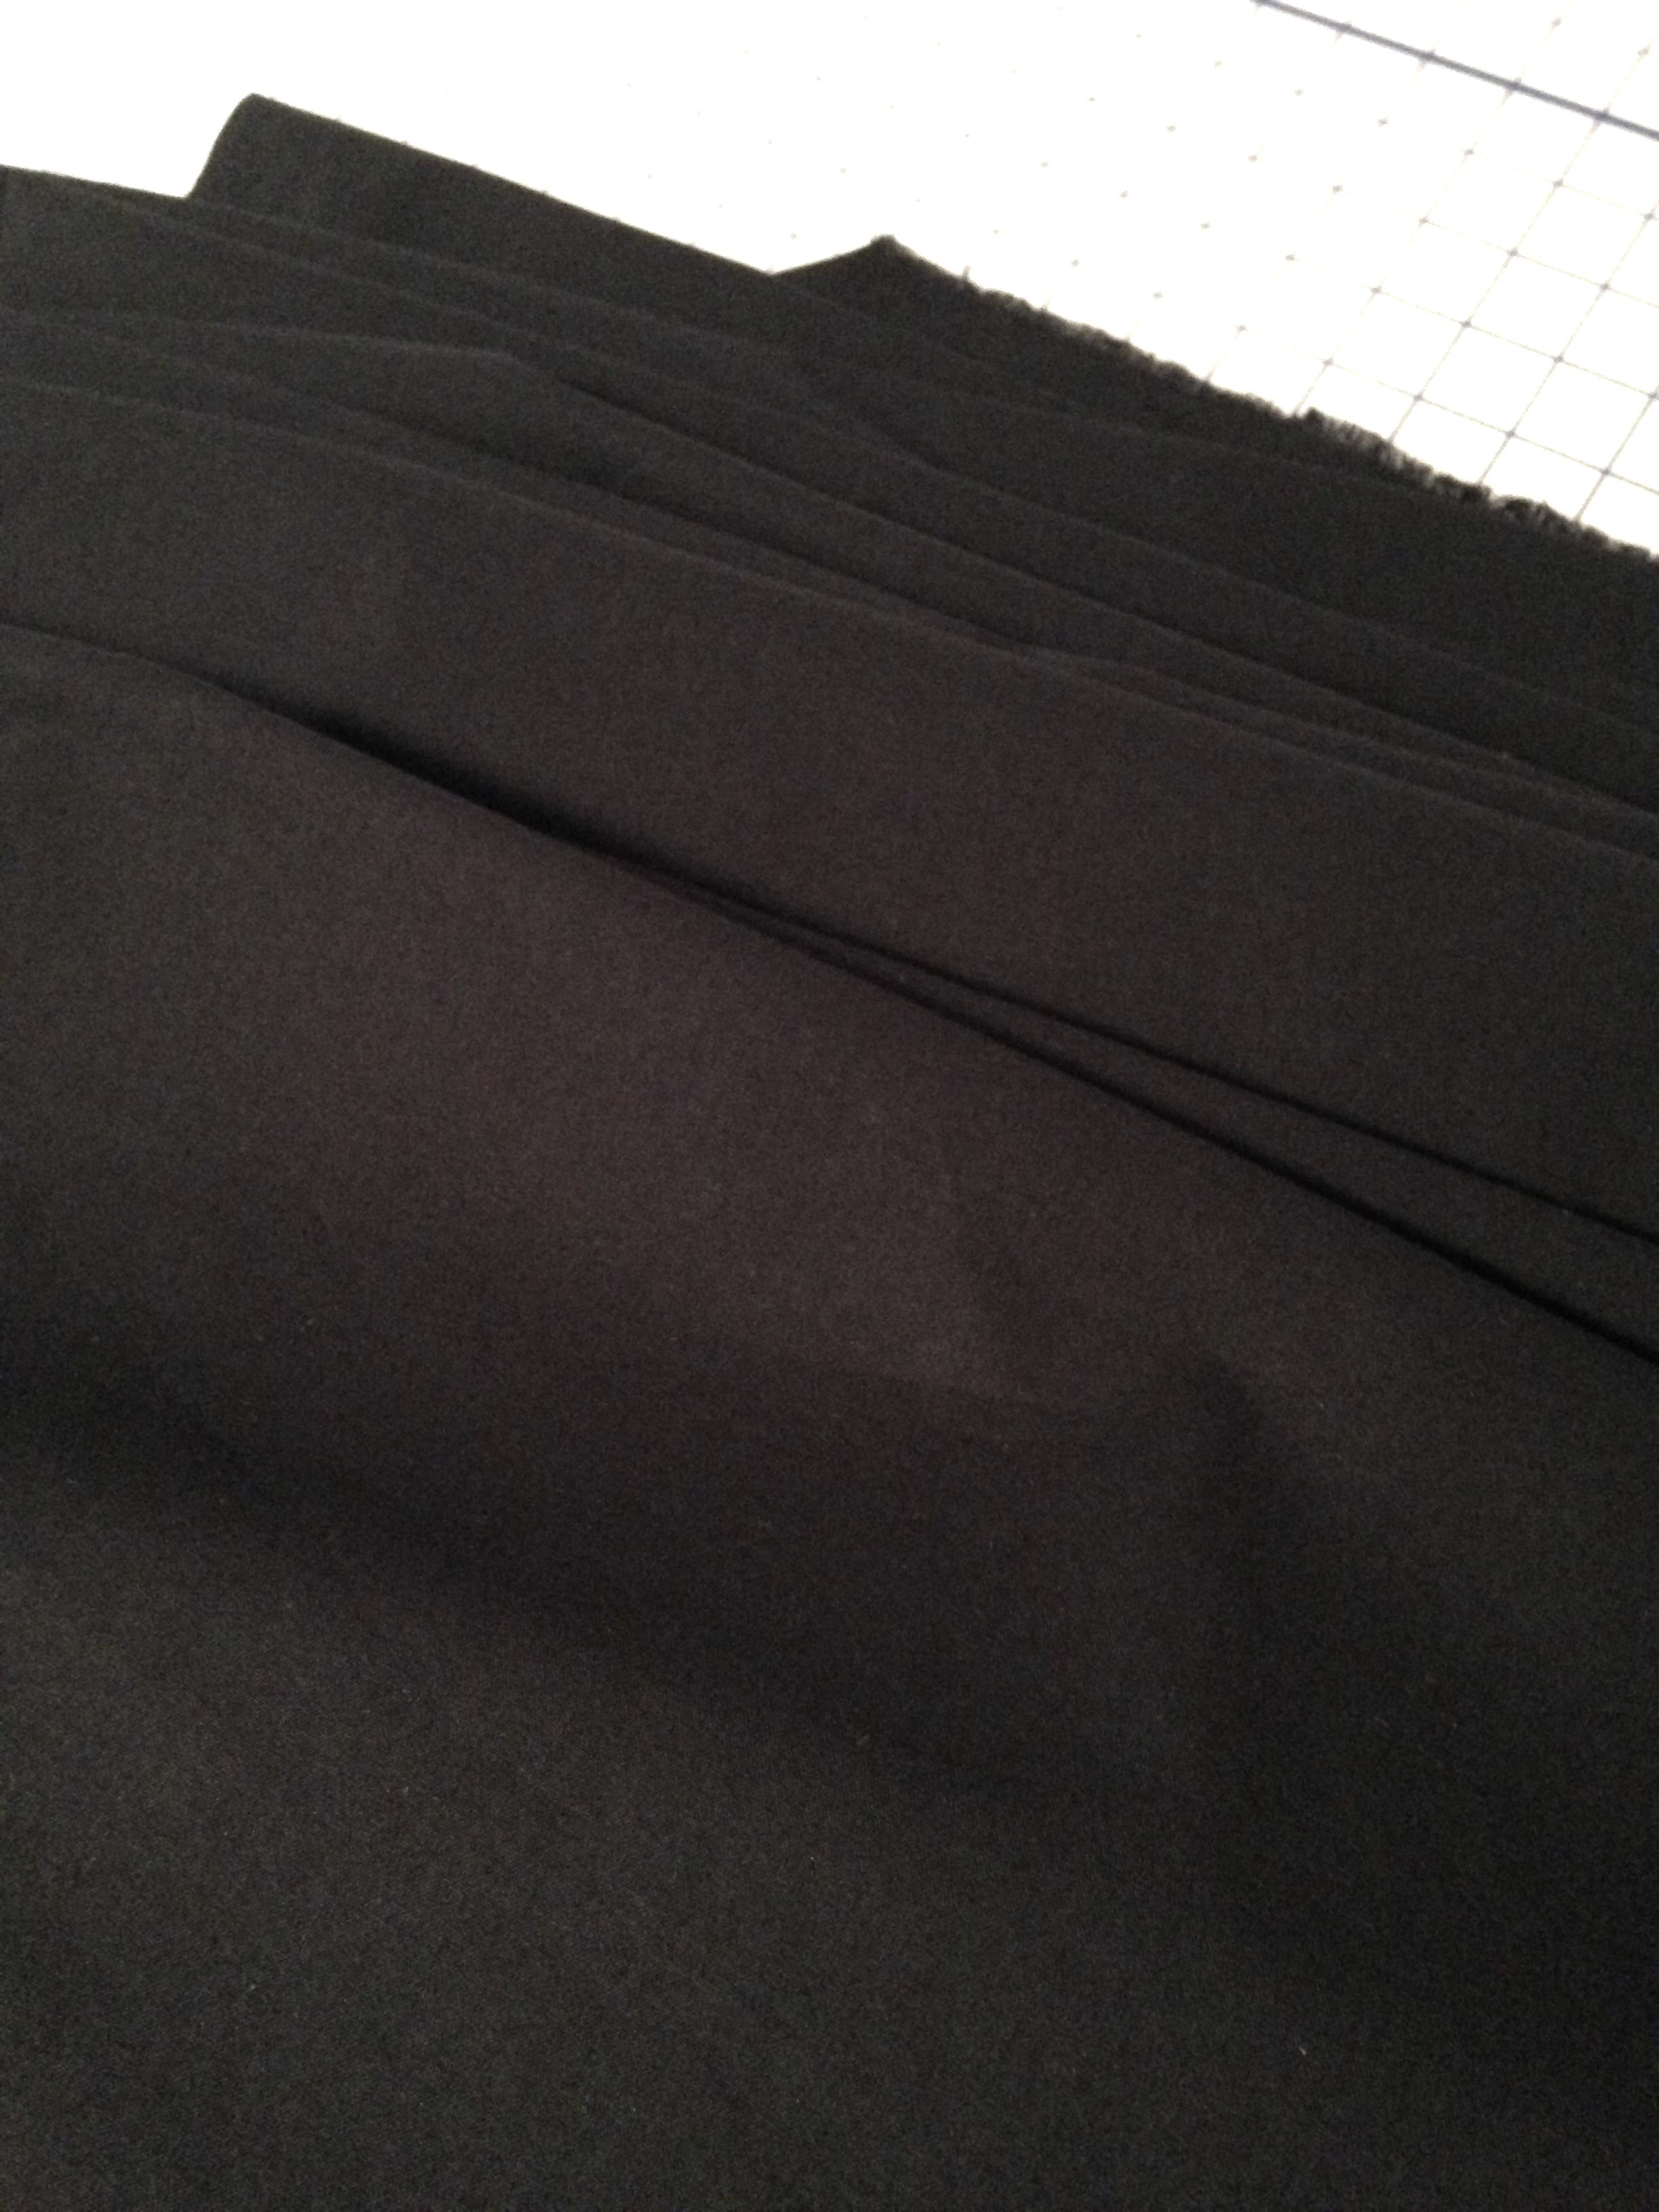 7 meters of fabric